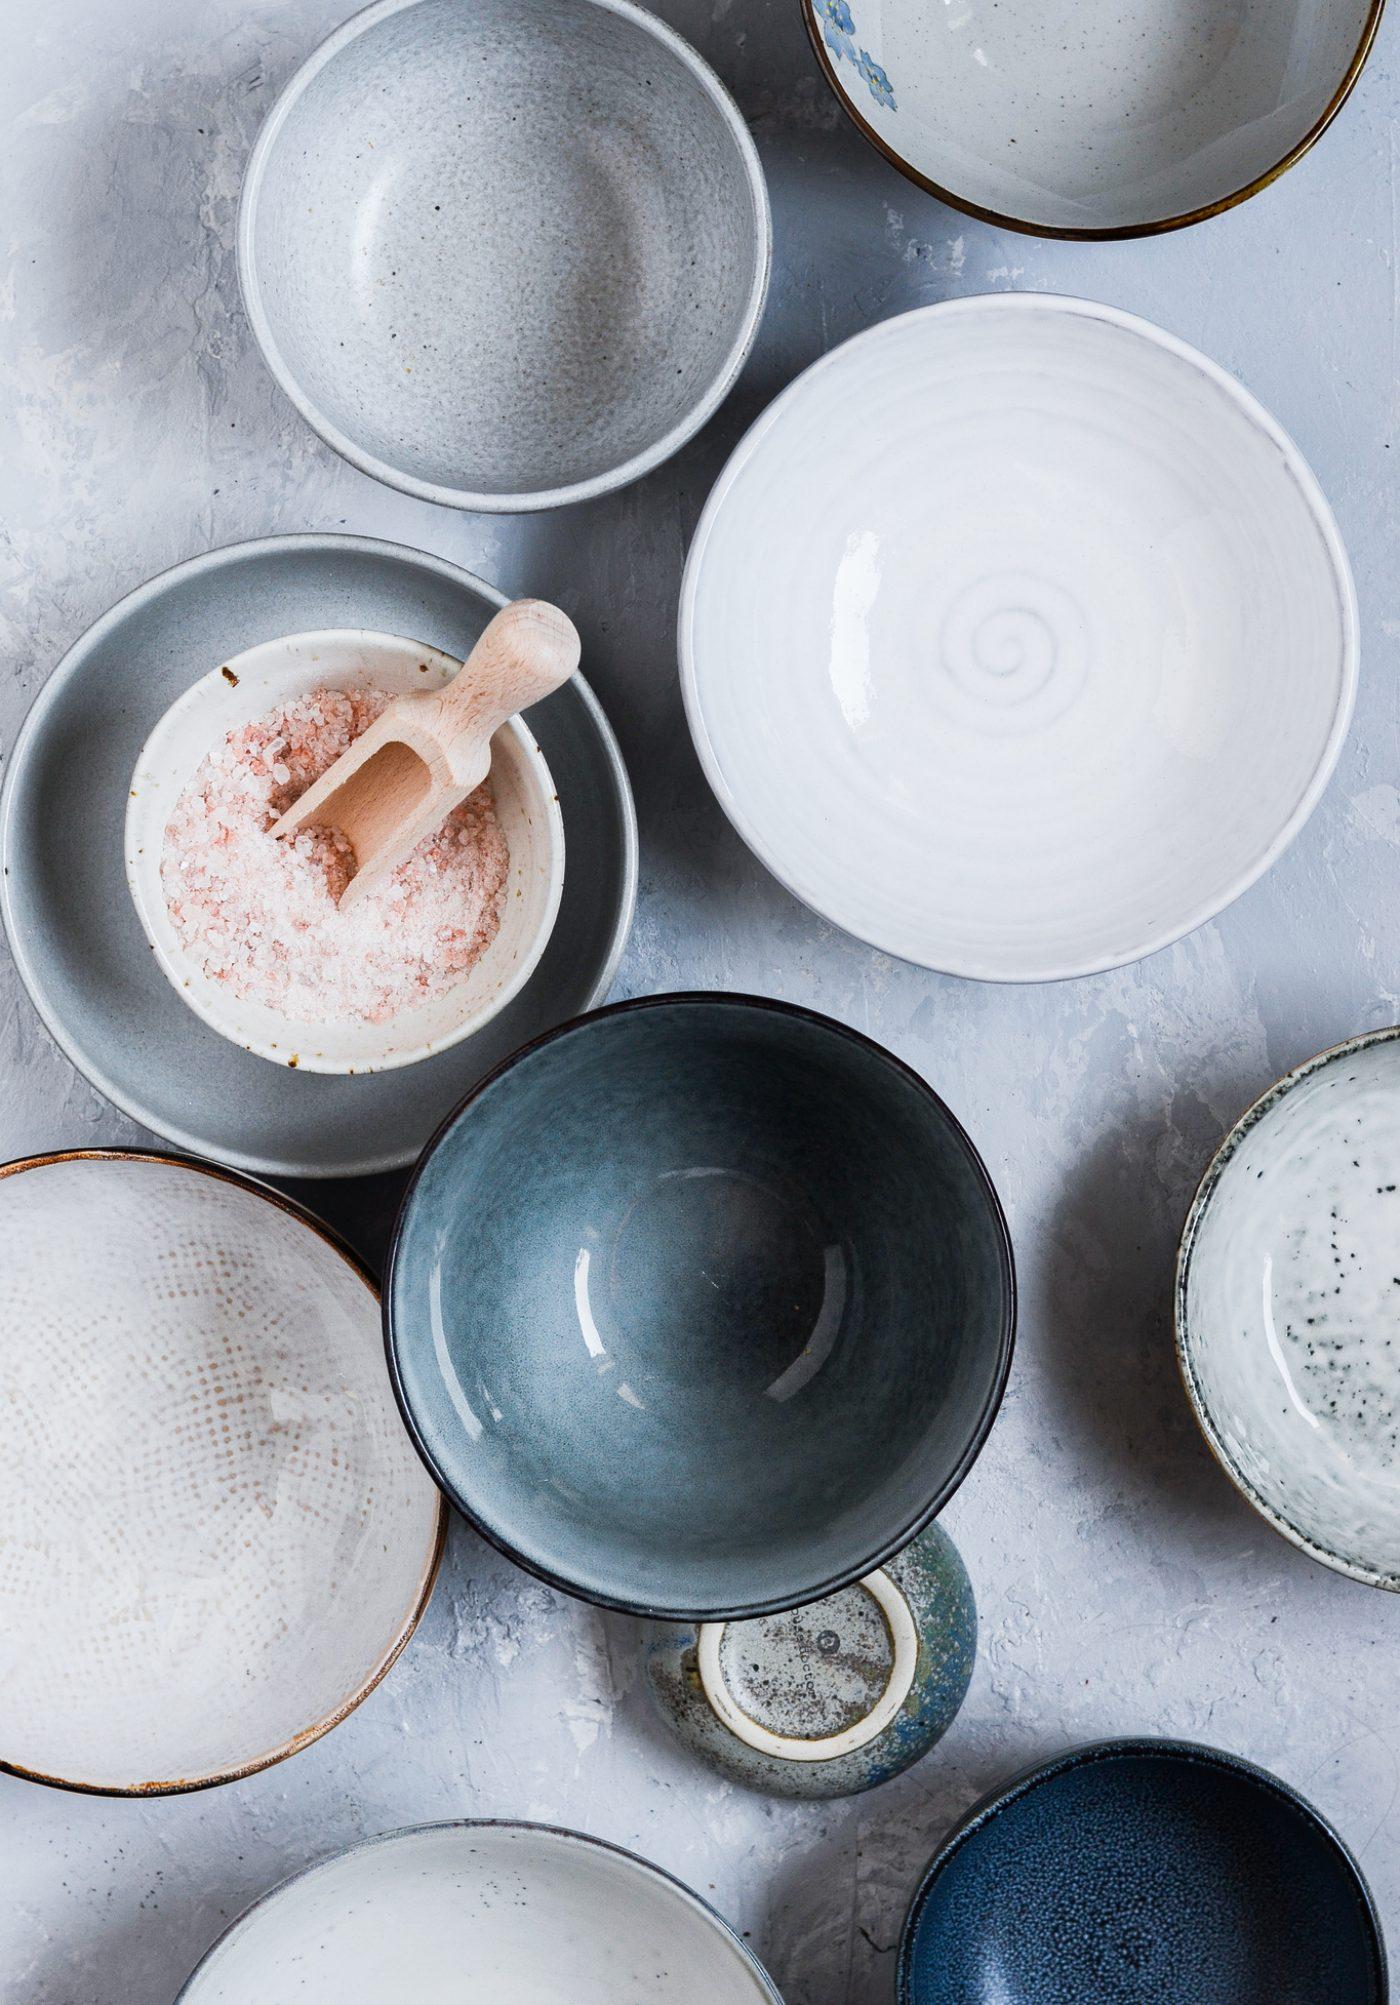 mine-skaale-keramik-samling